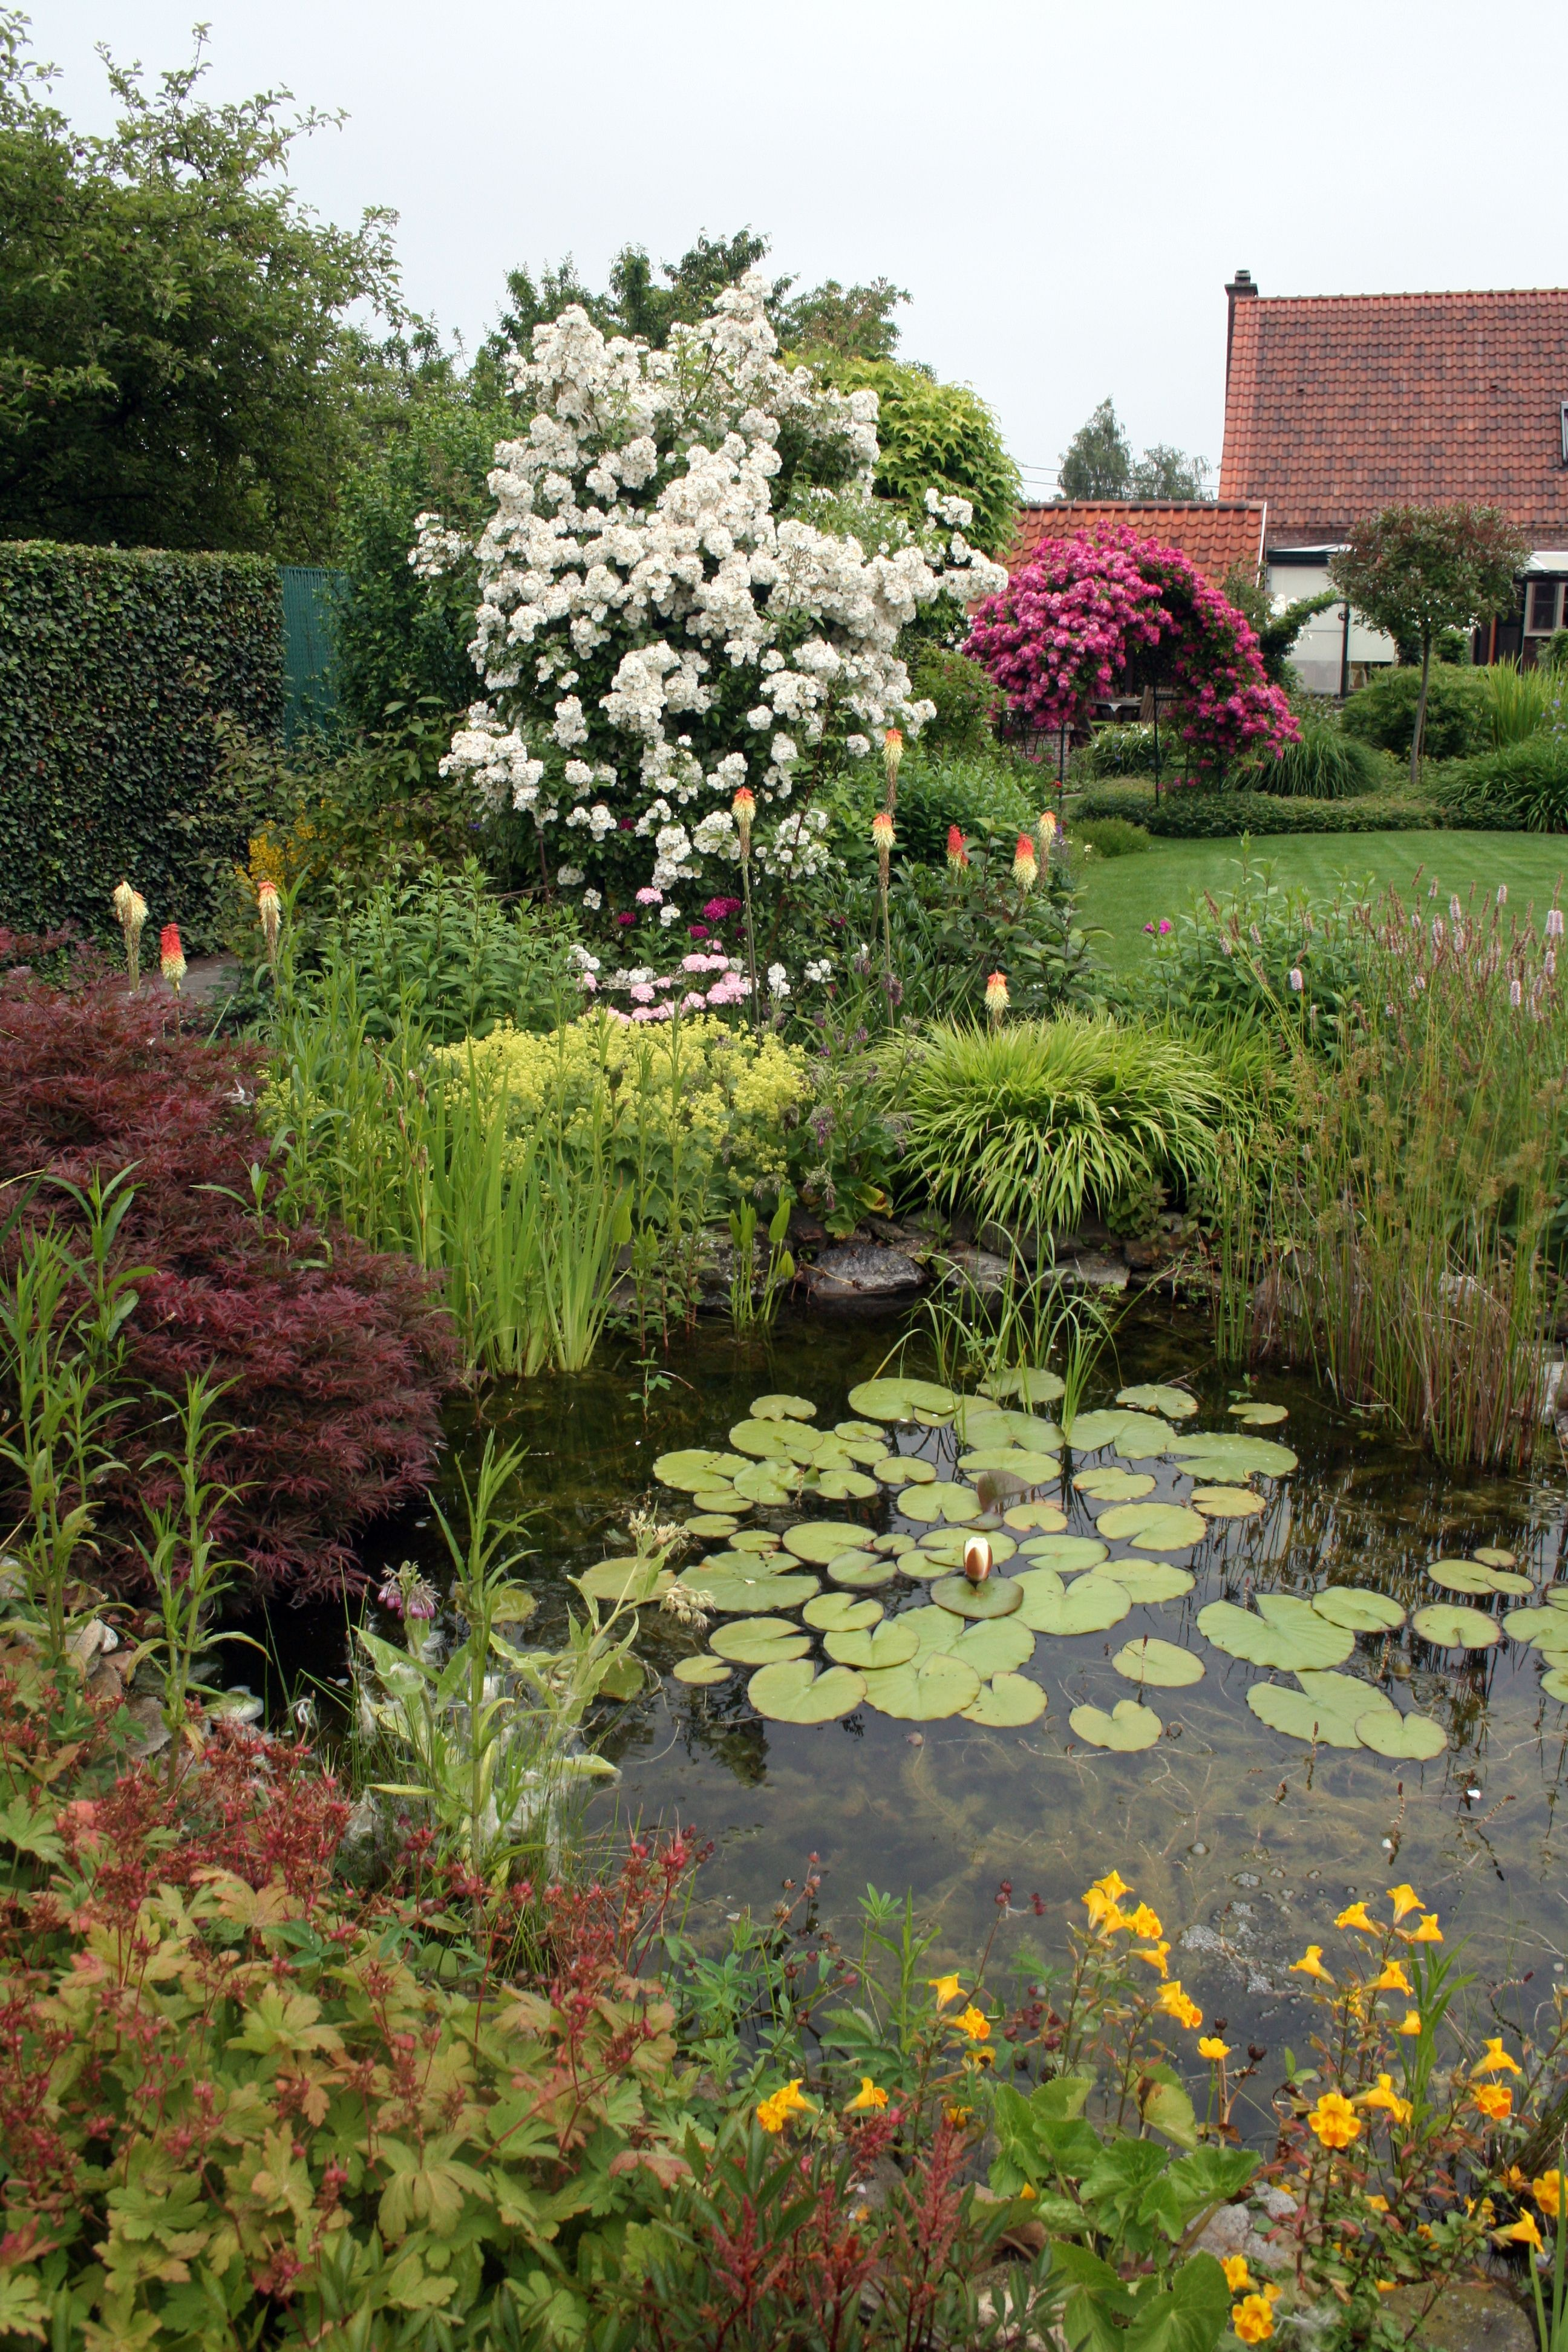 Pool Wasser Im Garten Bepflanzung Rose Graser Fackrllilie Gartenreise Belgien Holland Schoner Garten Bilder Garten Garten De